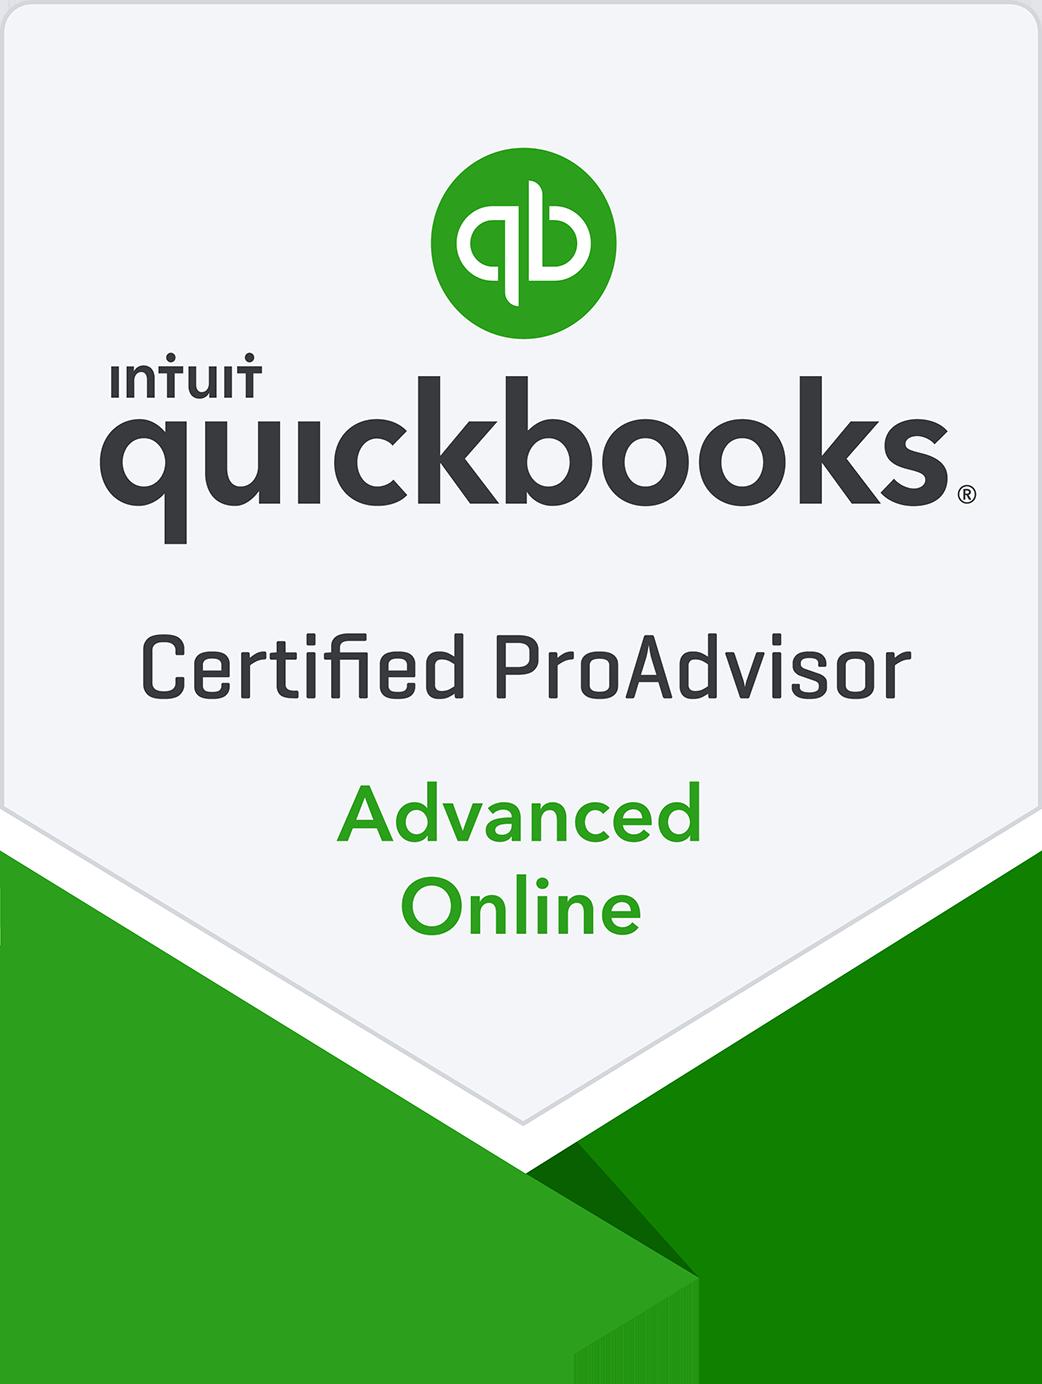 Certified QuickBooks Advance Online Proadvisor in the greater Mobile, AL area